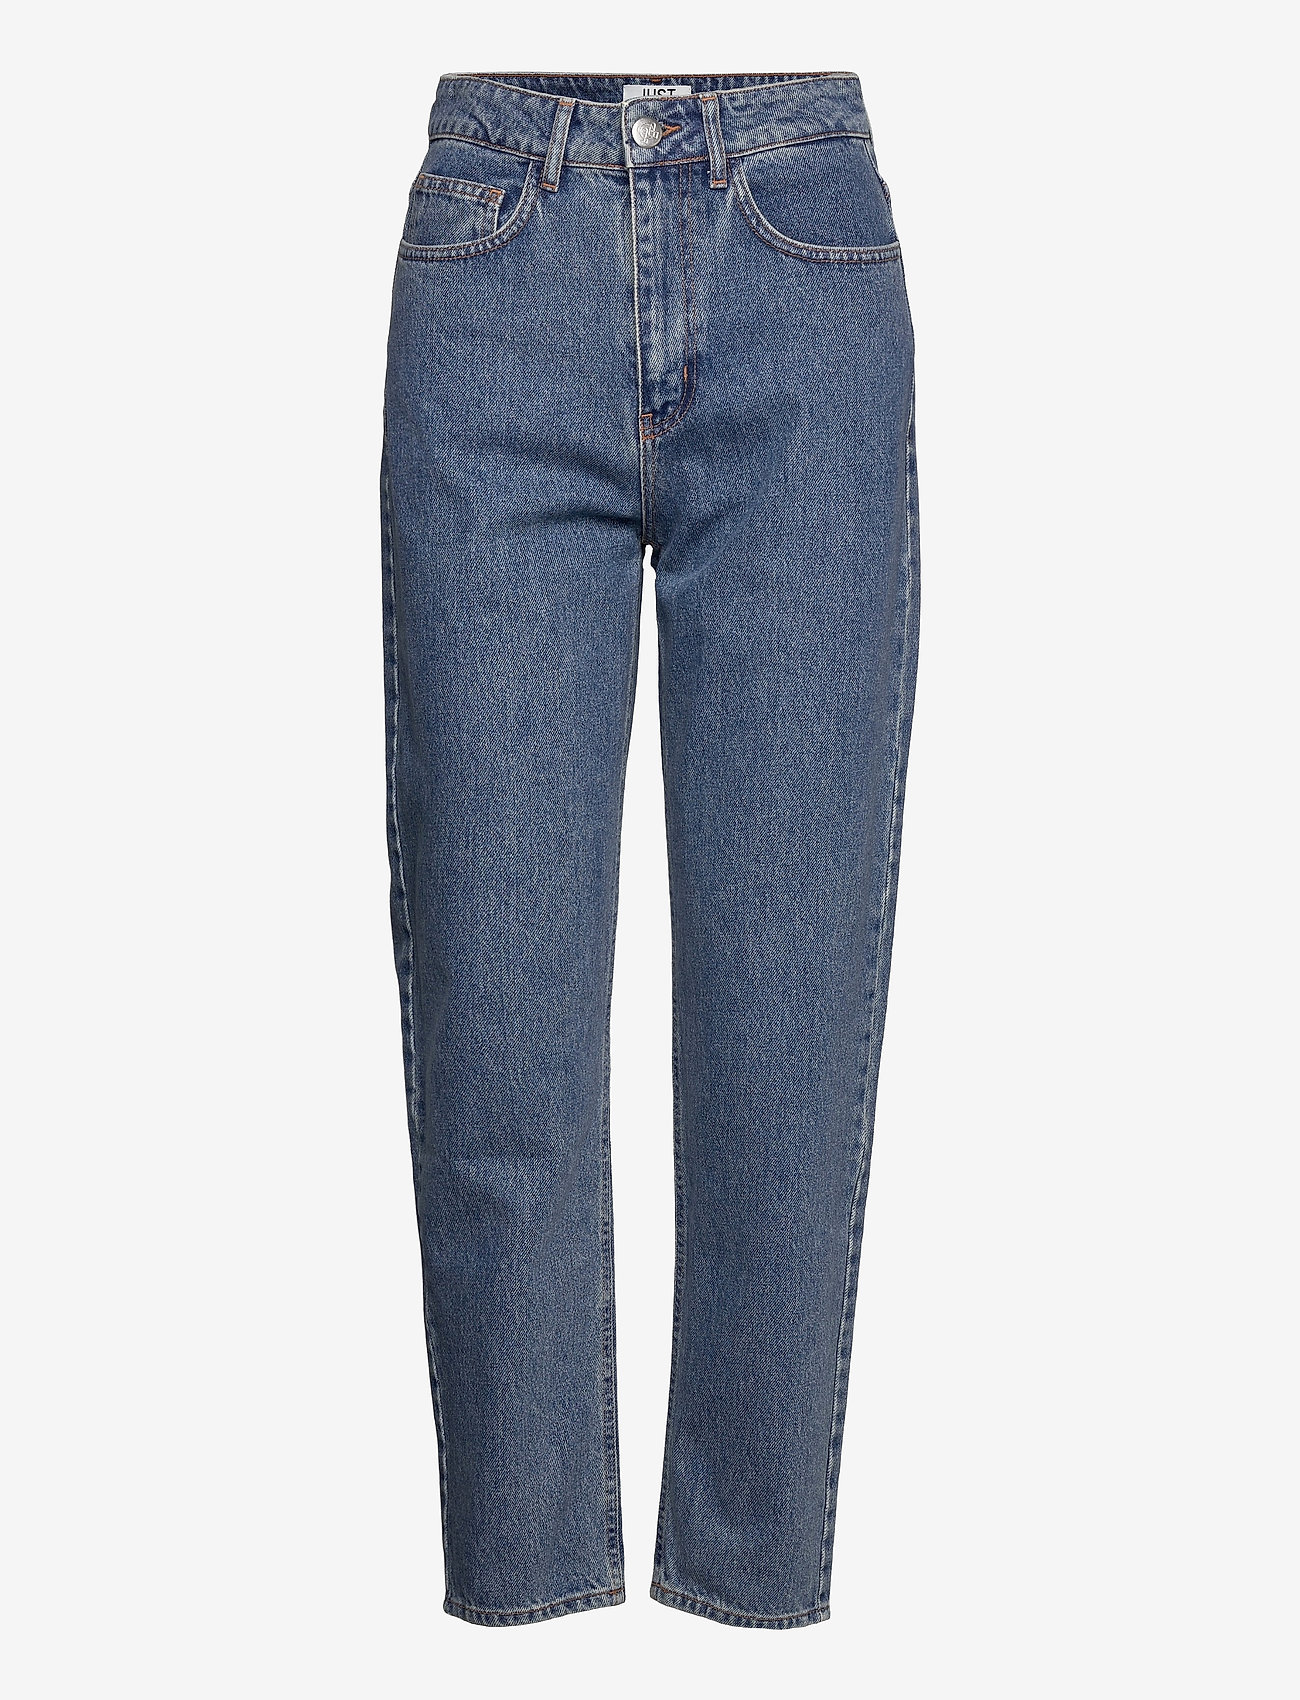 Just Female - Stormy jeans 0104 - straight regular - light blue - 0